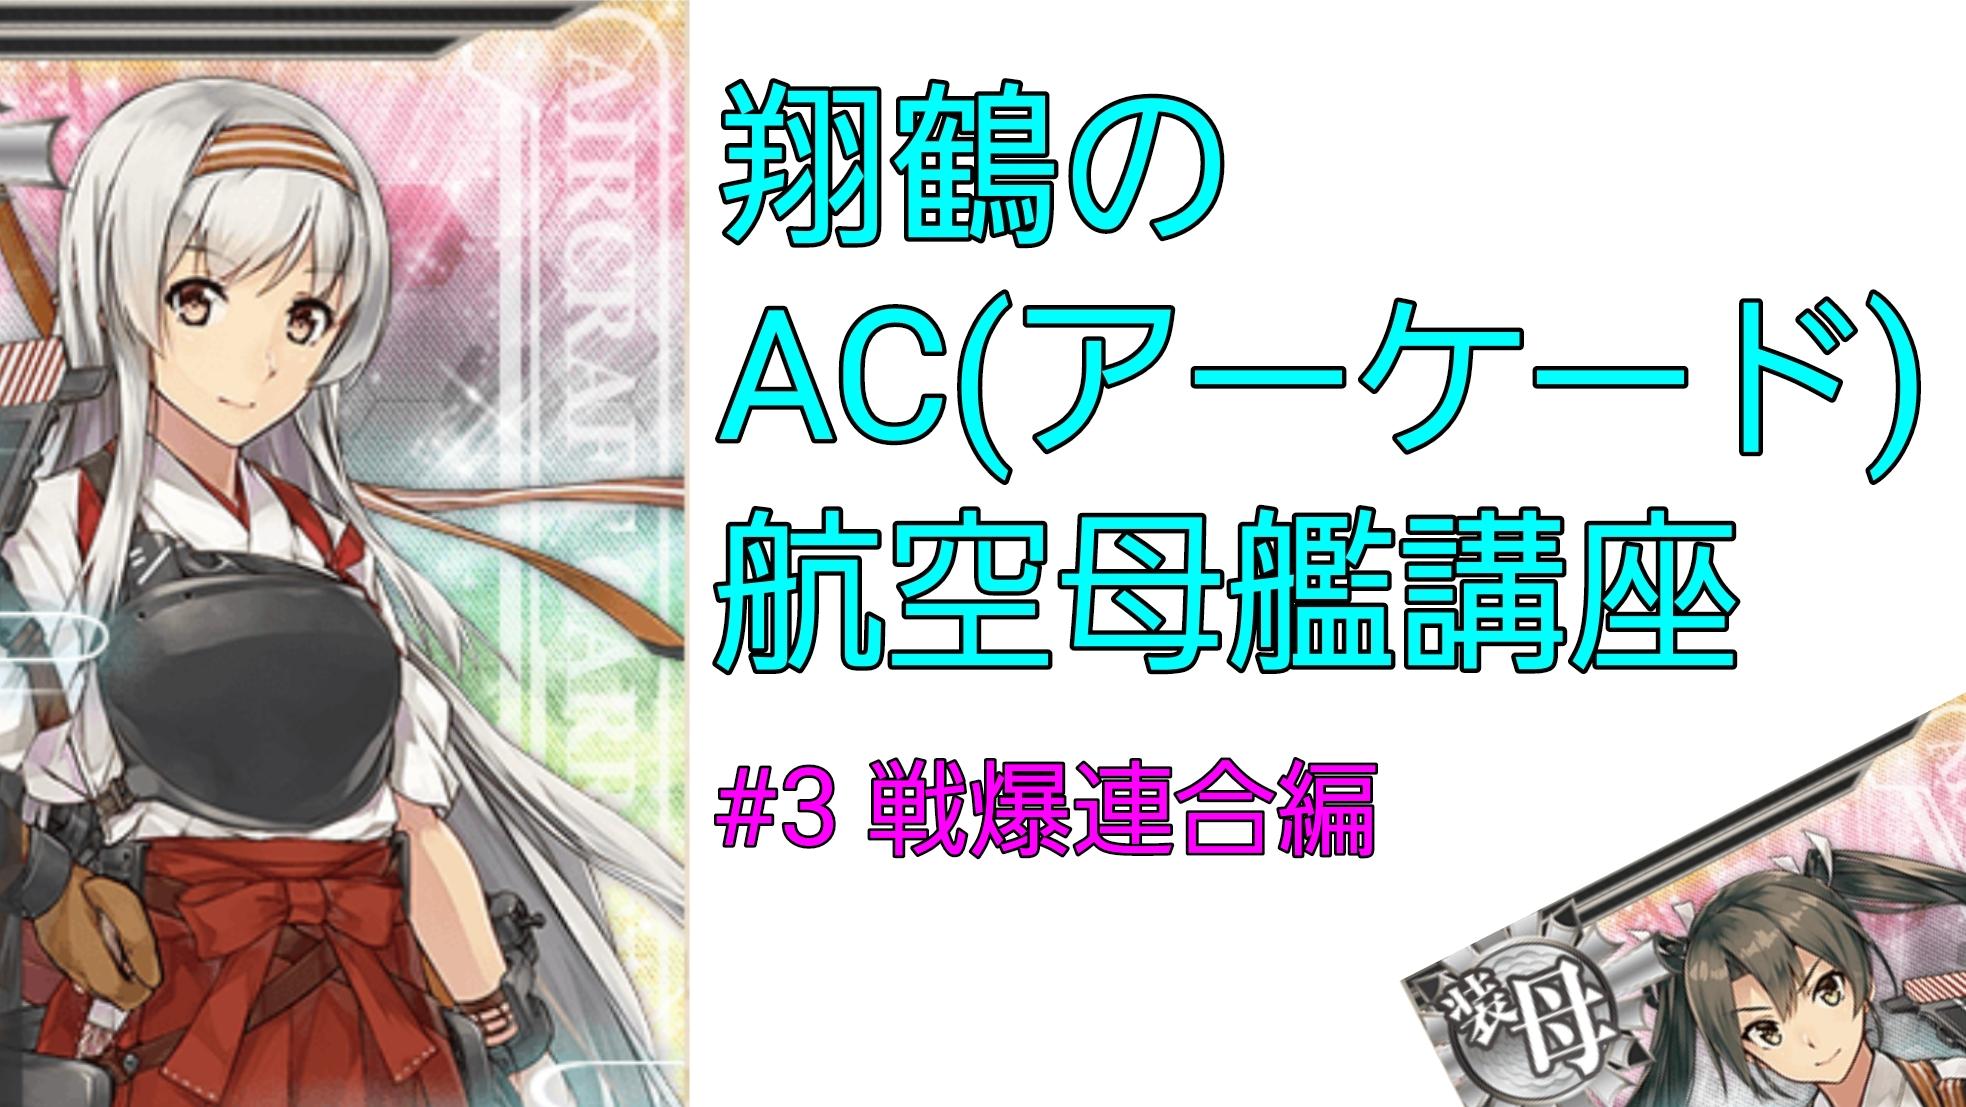 #3 翔鶴のAC(アーケード)航空母艦講座 戦爆連合編